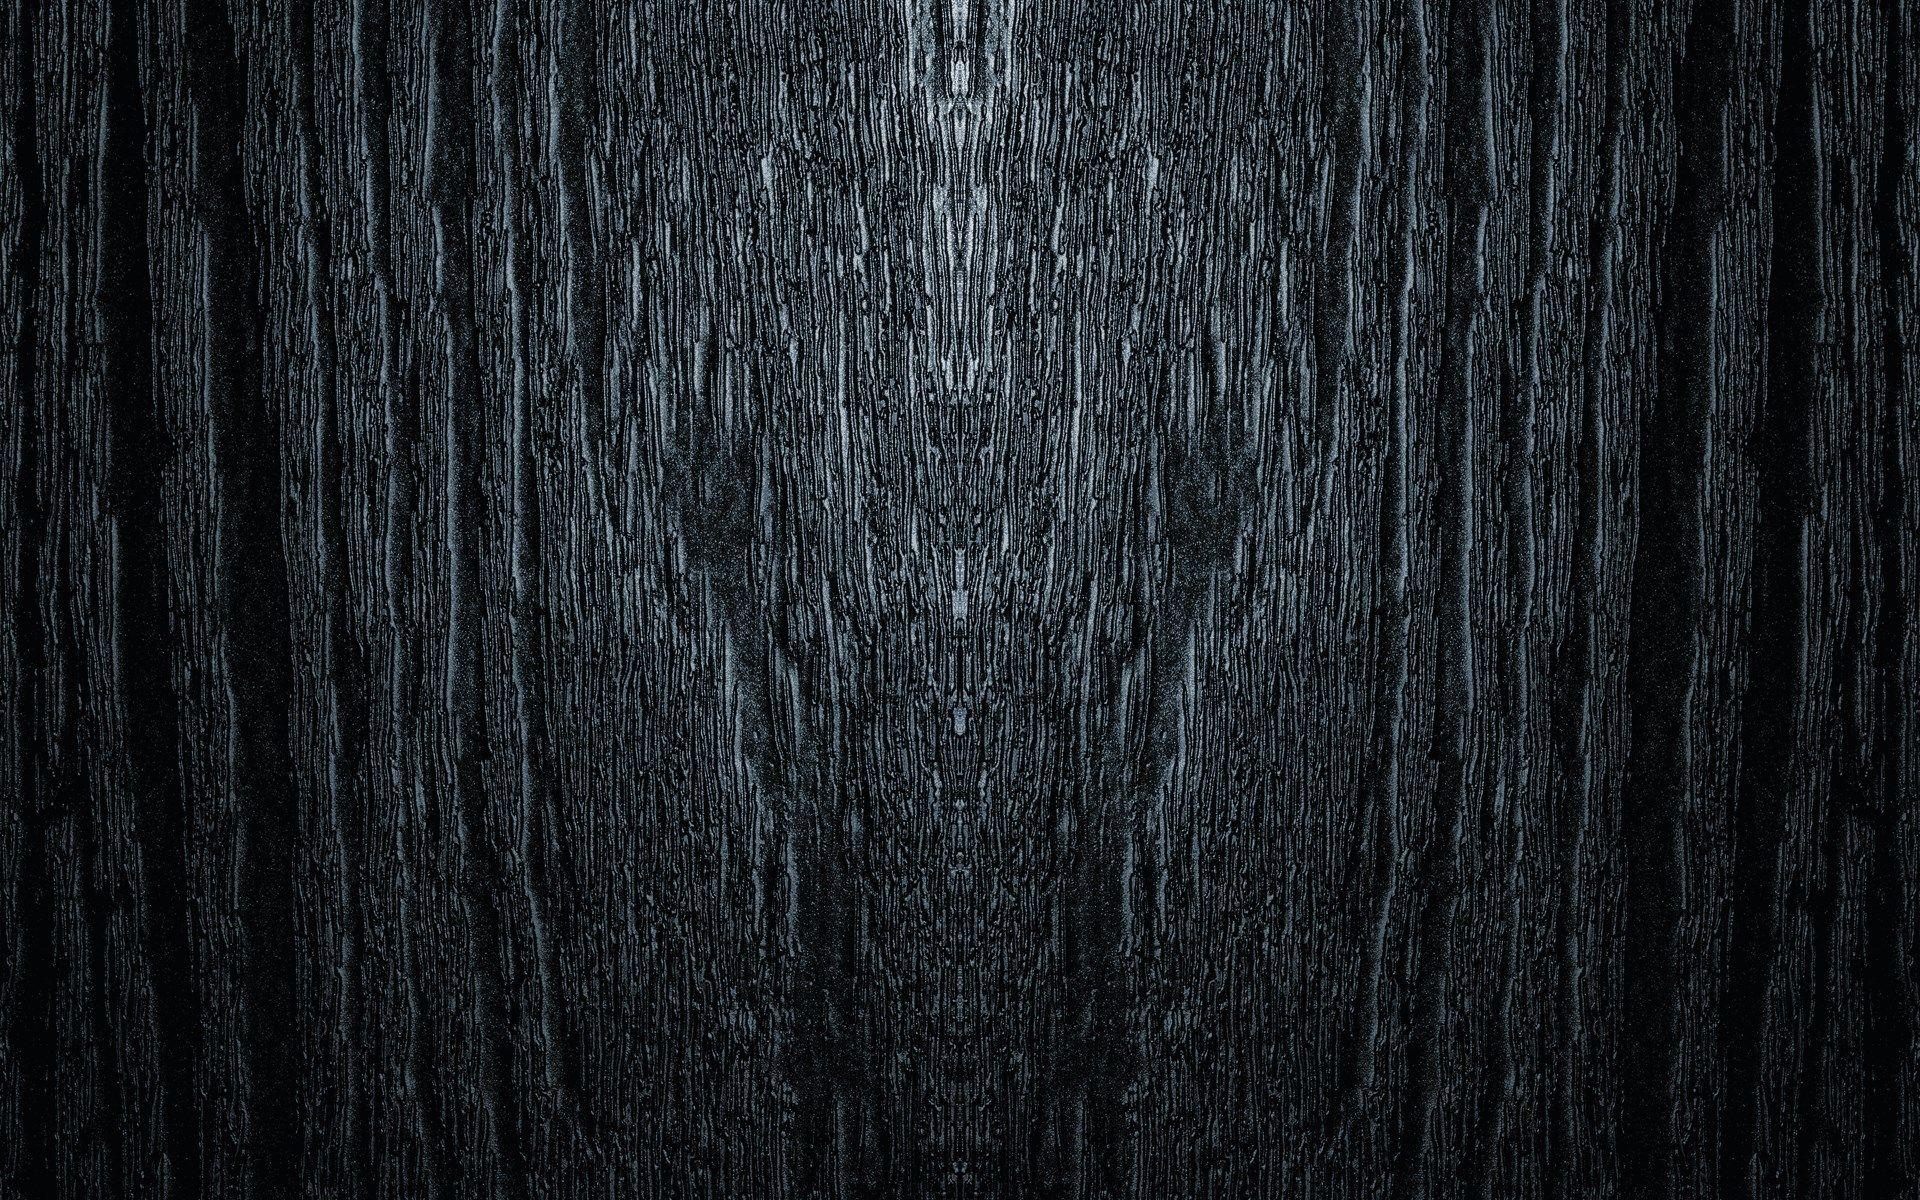 Dark Woods Hd Background Dark Wood Wallpaper Black Wood Texture Textured Wallpaper